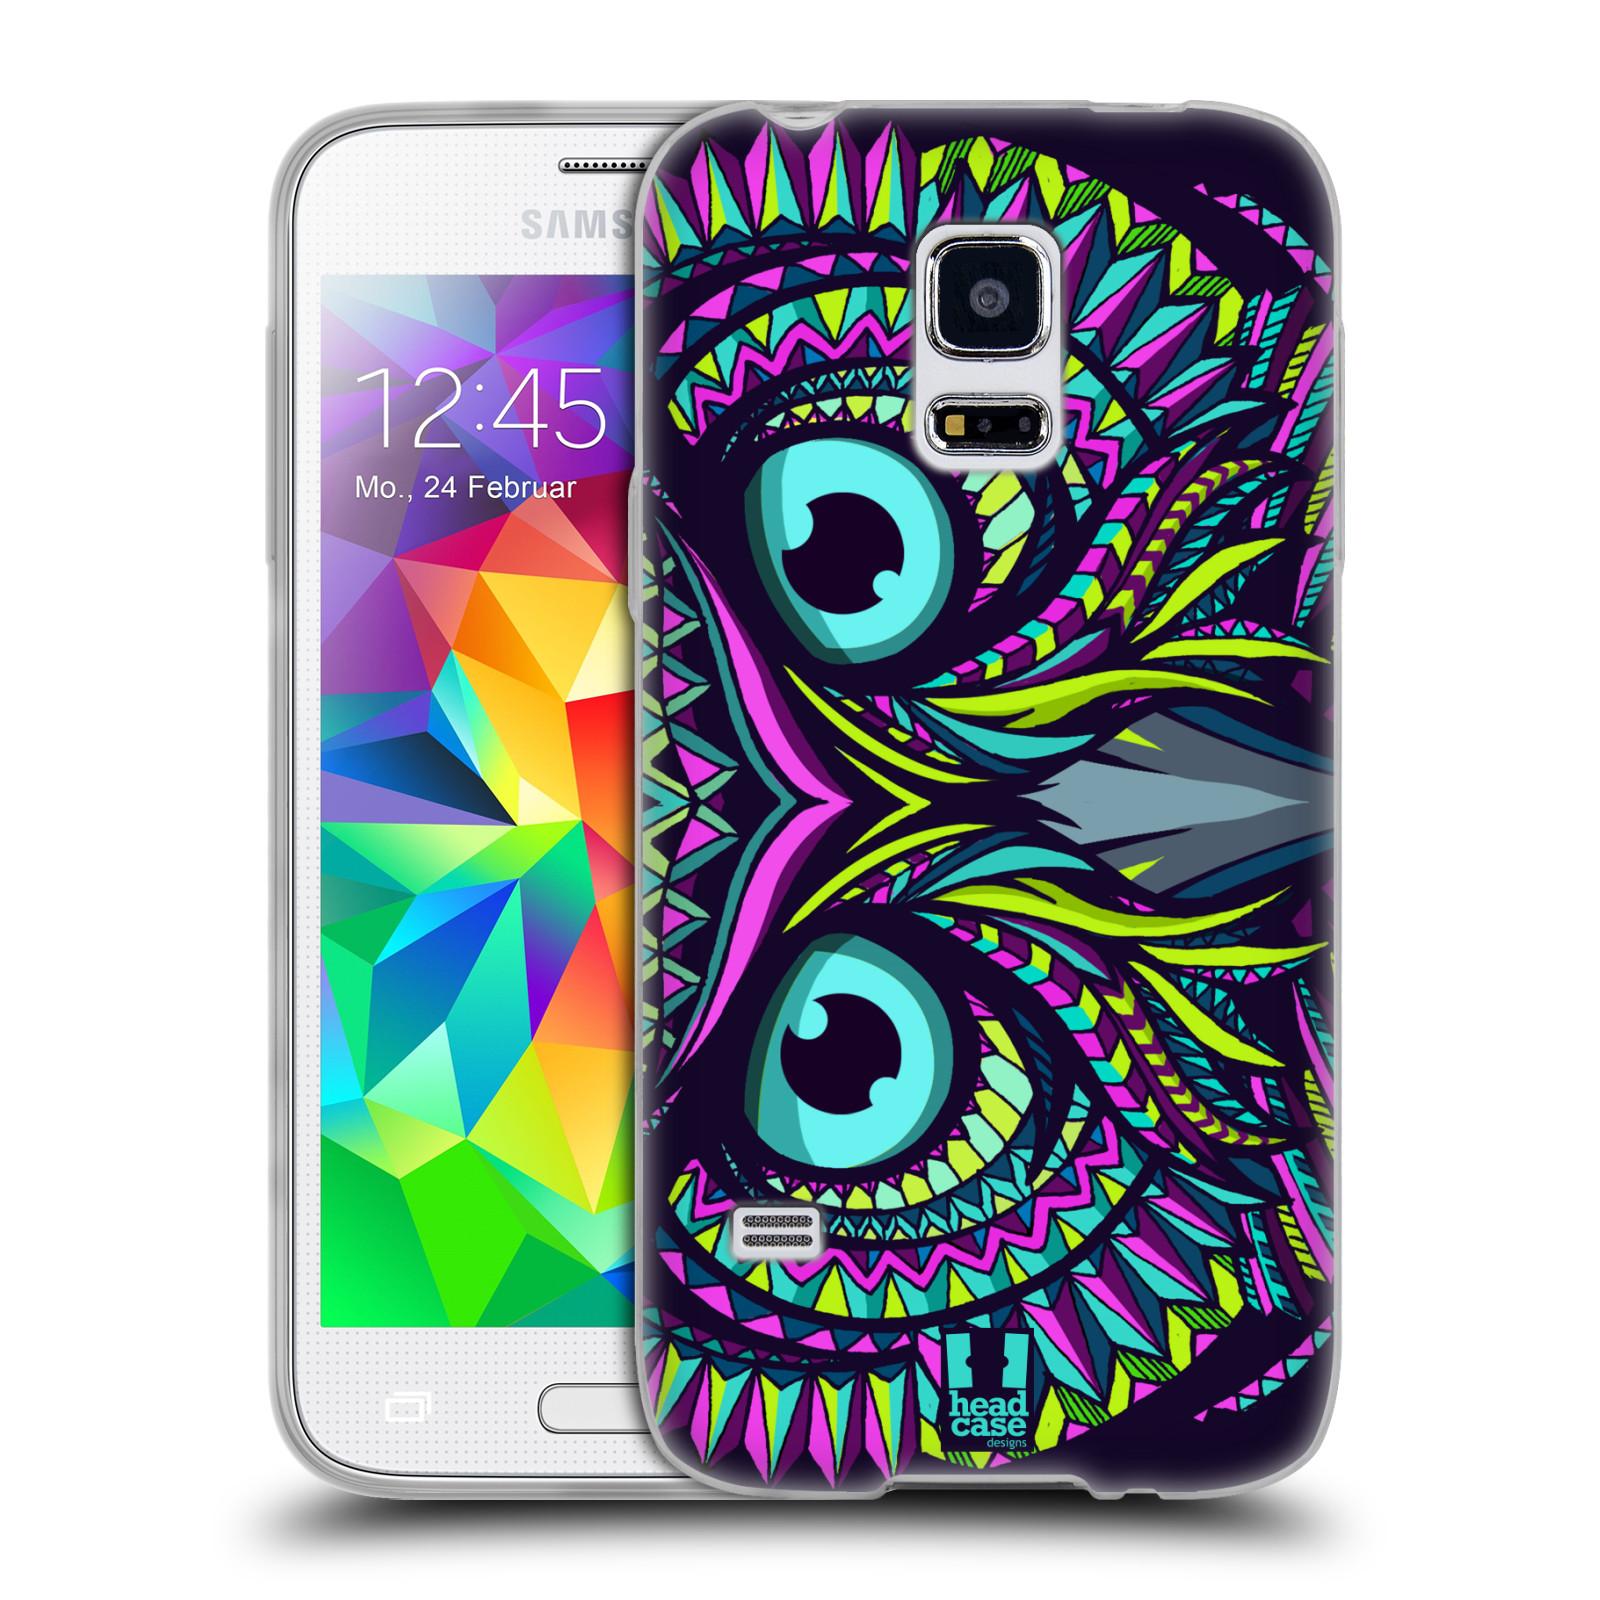 HEAD CASE silikonový obal na mobil Samsung Galaxy S5 MINI vzor Aztécký motiv zvíře sova